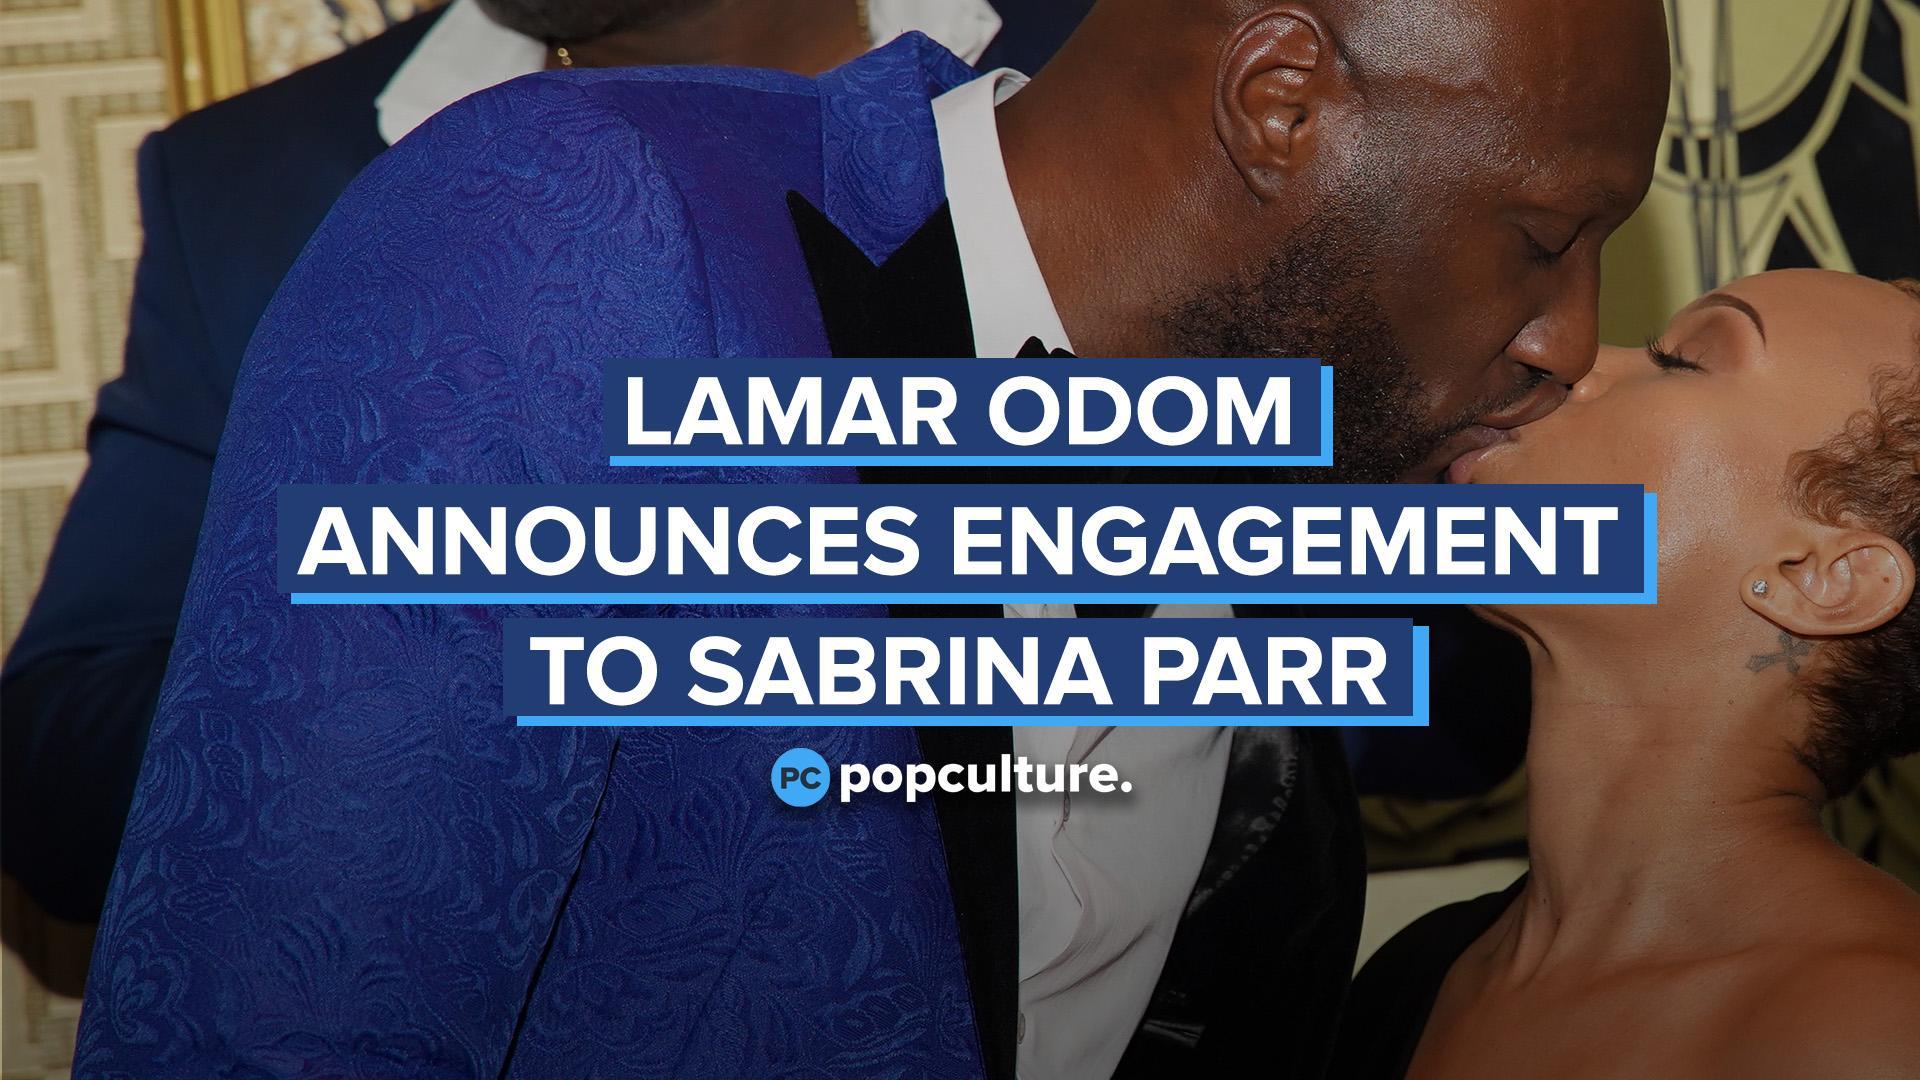 Lamar Odom Announces Engagement to Sabrina Parr screen capture